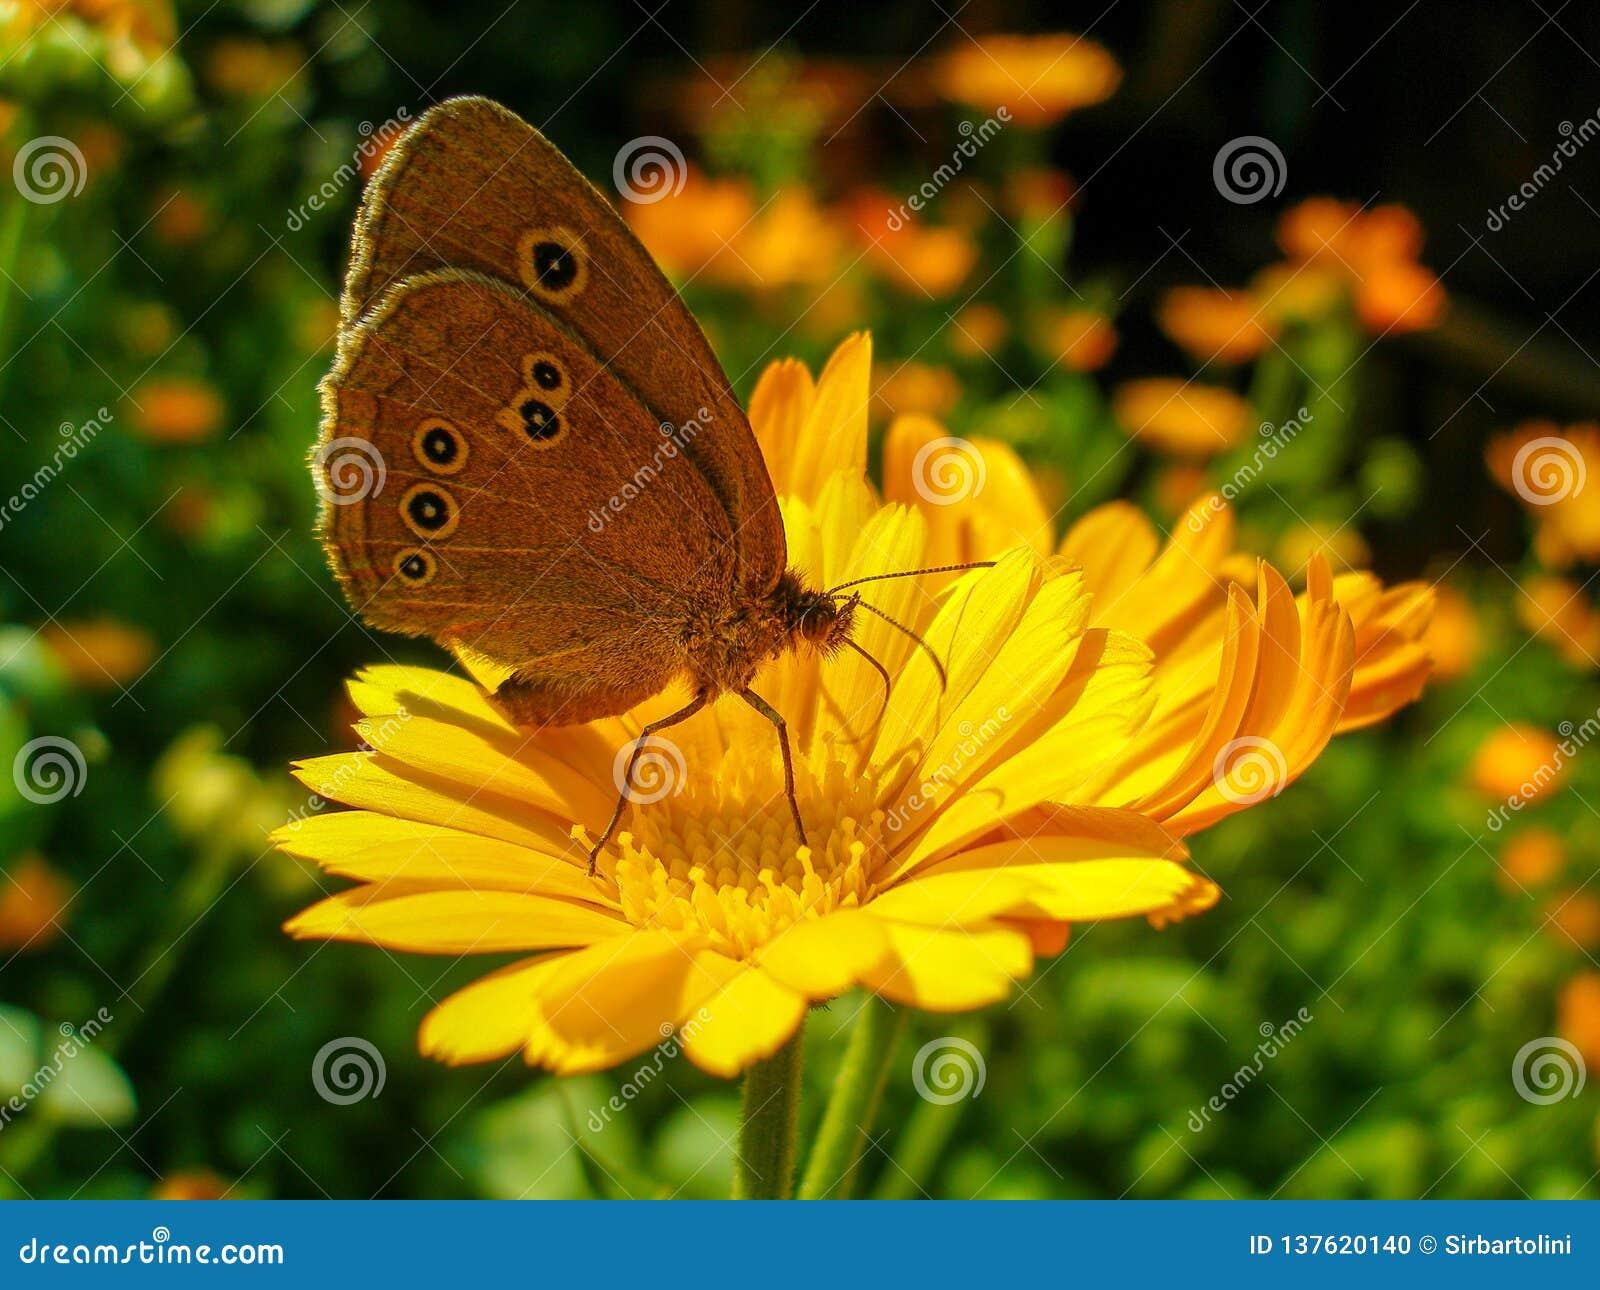 Ringlet butterfly sitting on Marigold flower.